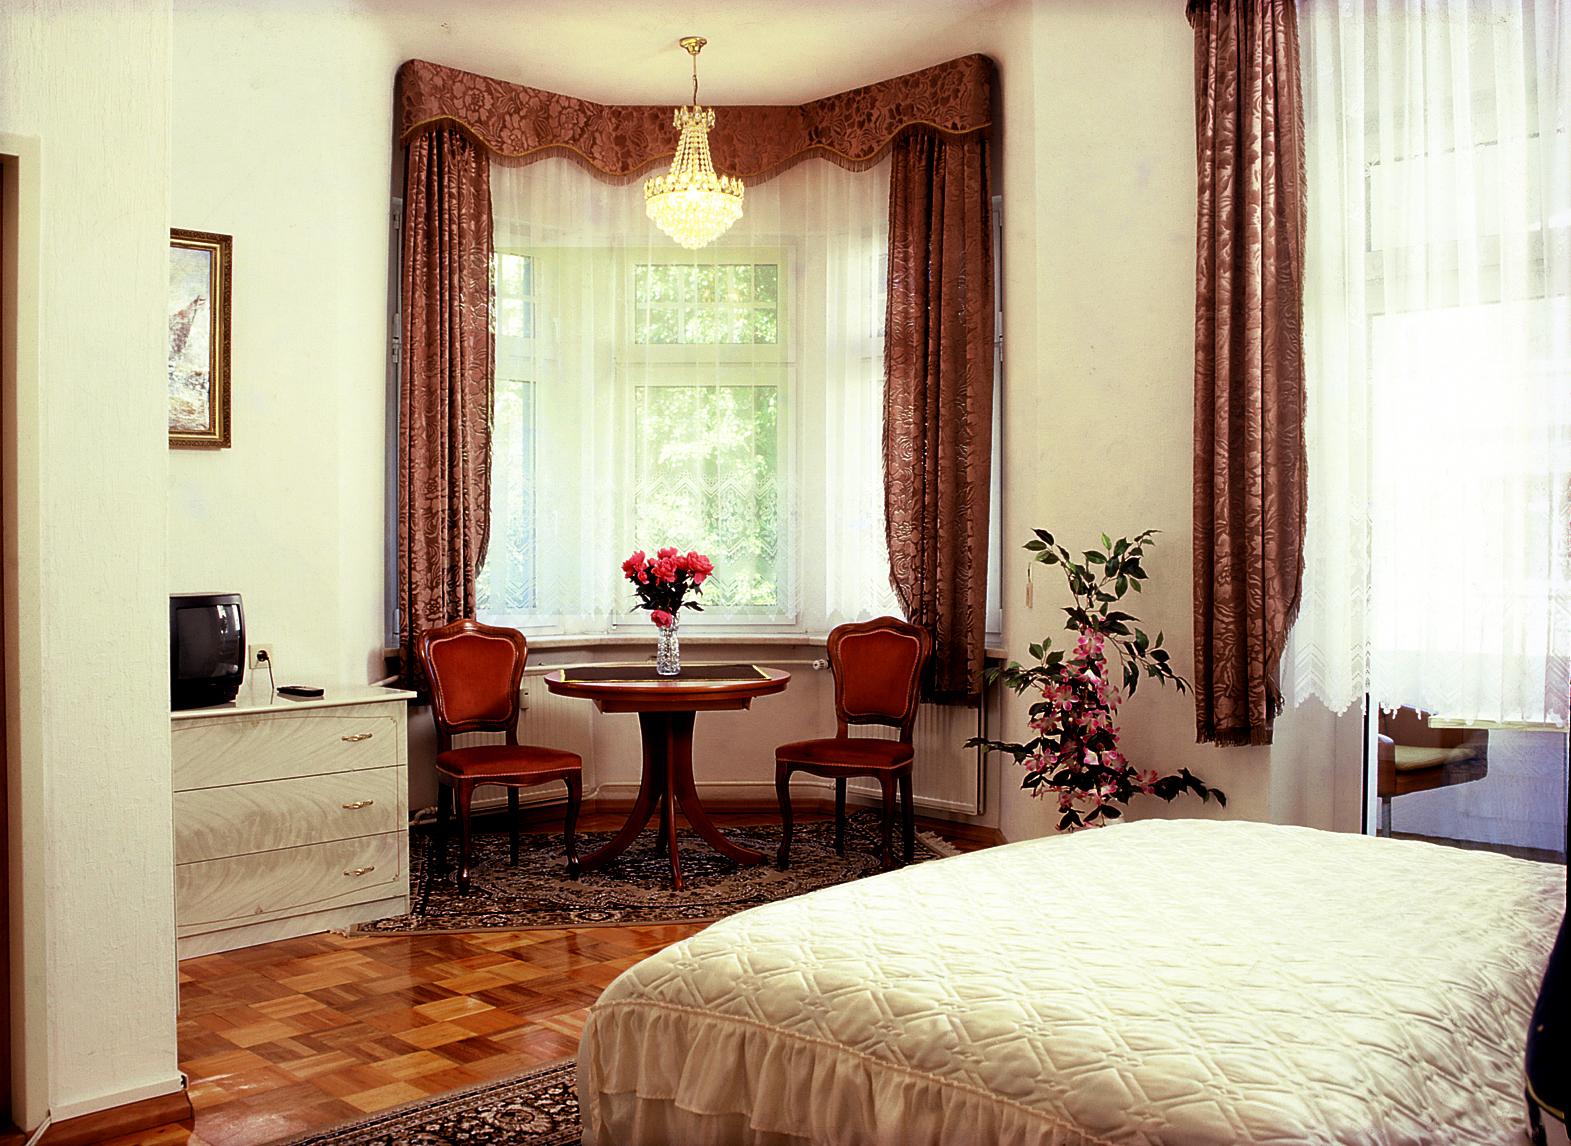 hotel zu den linden dresden w hirsch kontakt. Black Bedroom Furniture Sets. Home Design Ideas